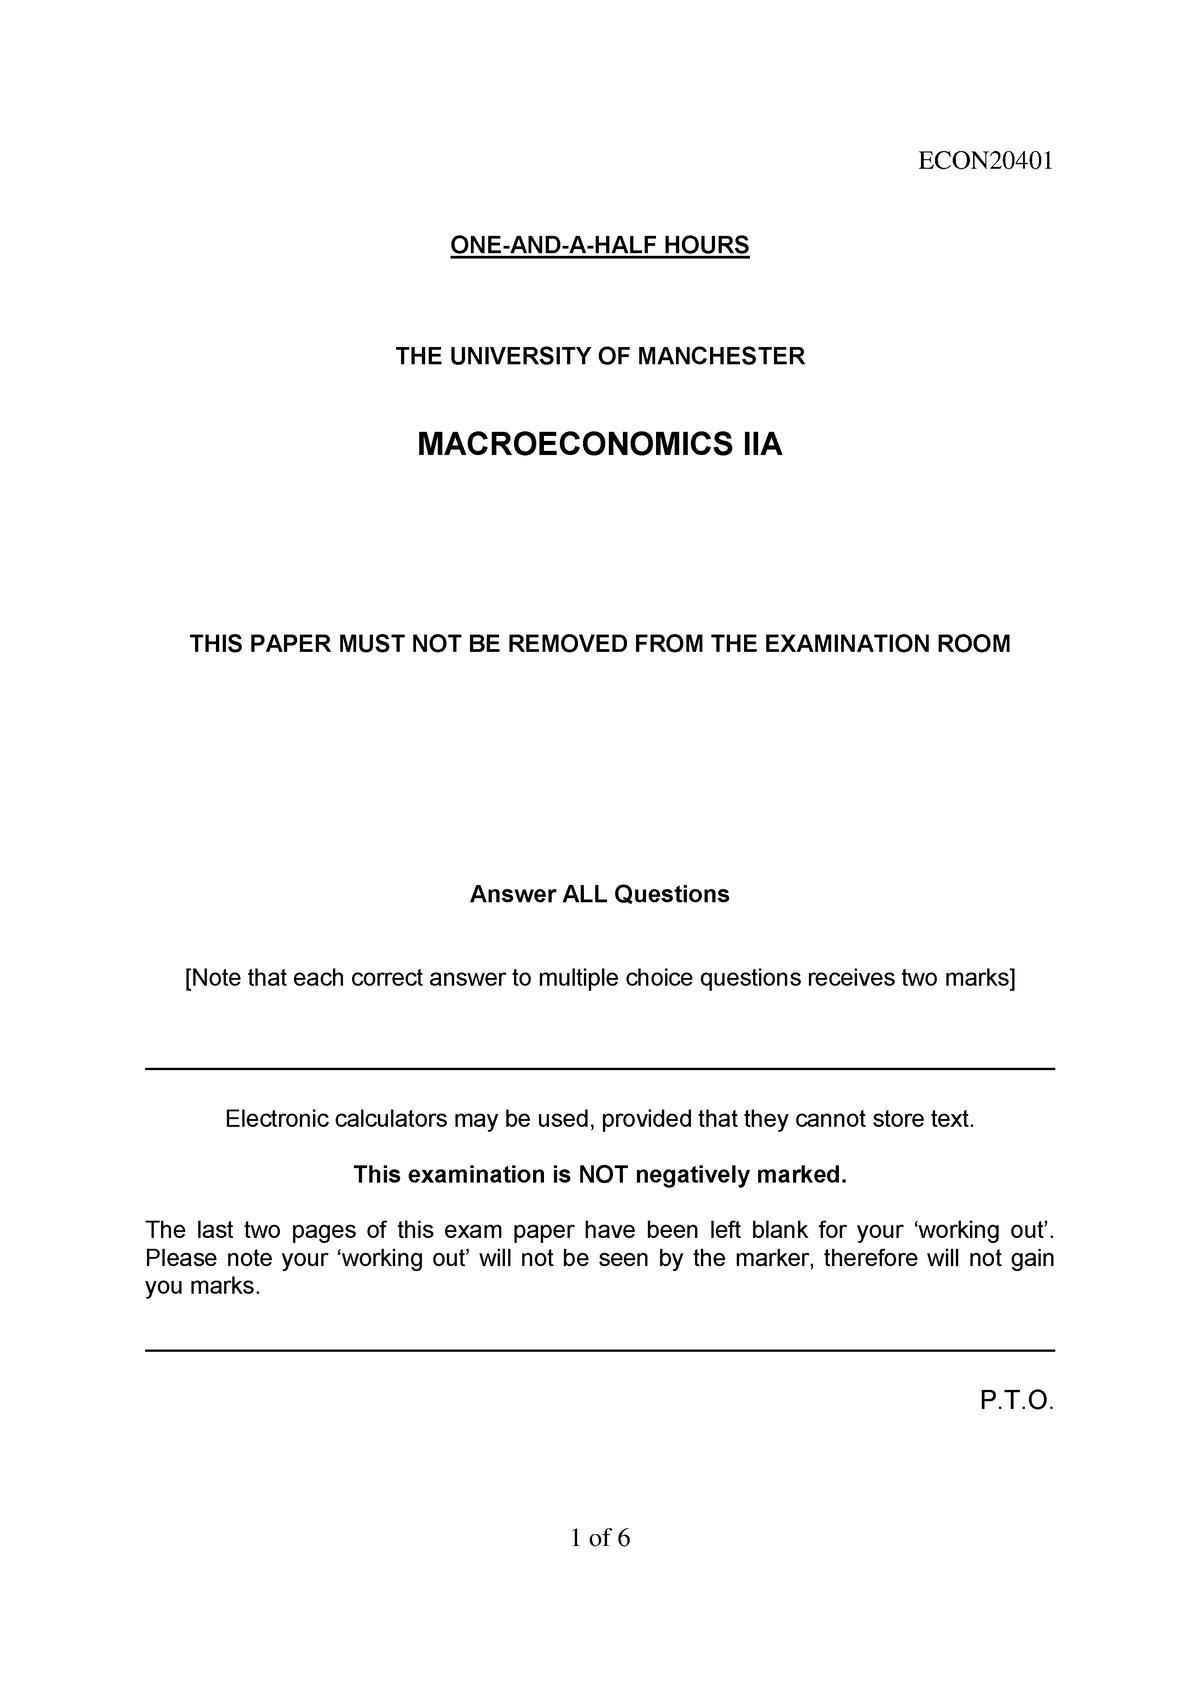 Exam 2015, questions and answers pdf - Macroeconomics IIA